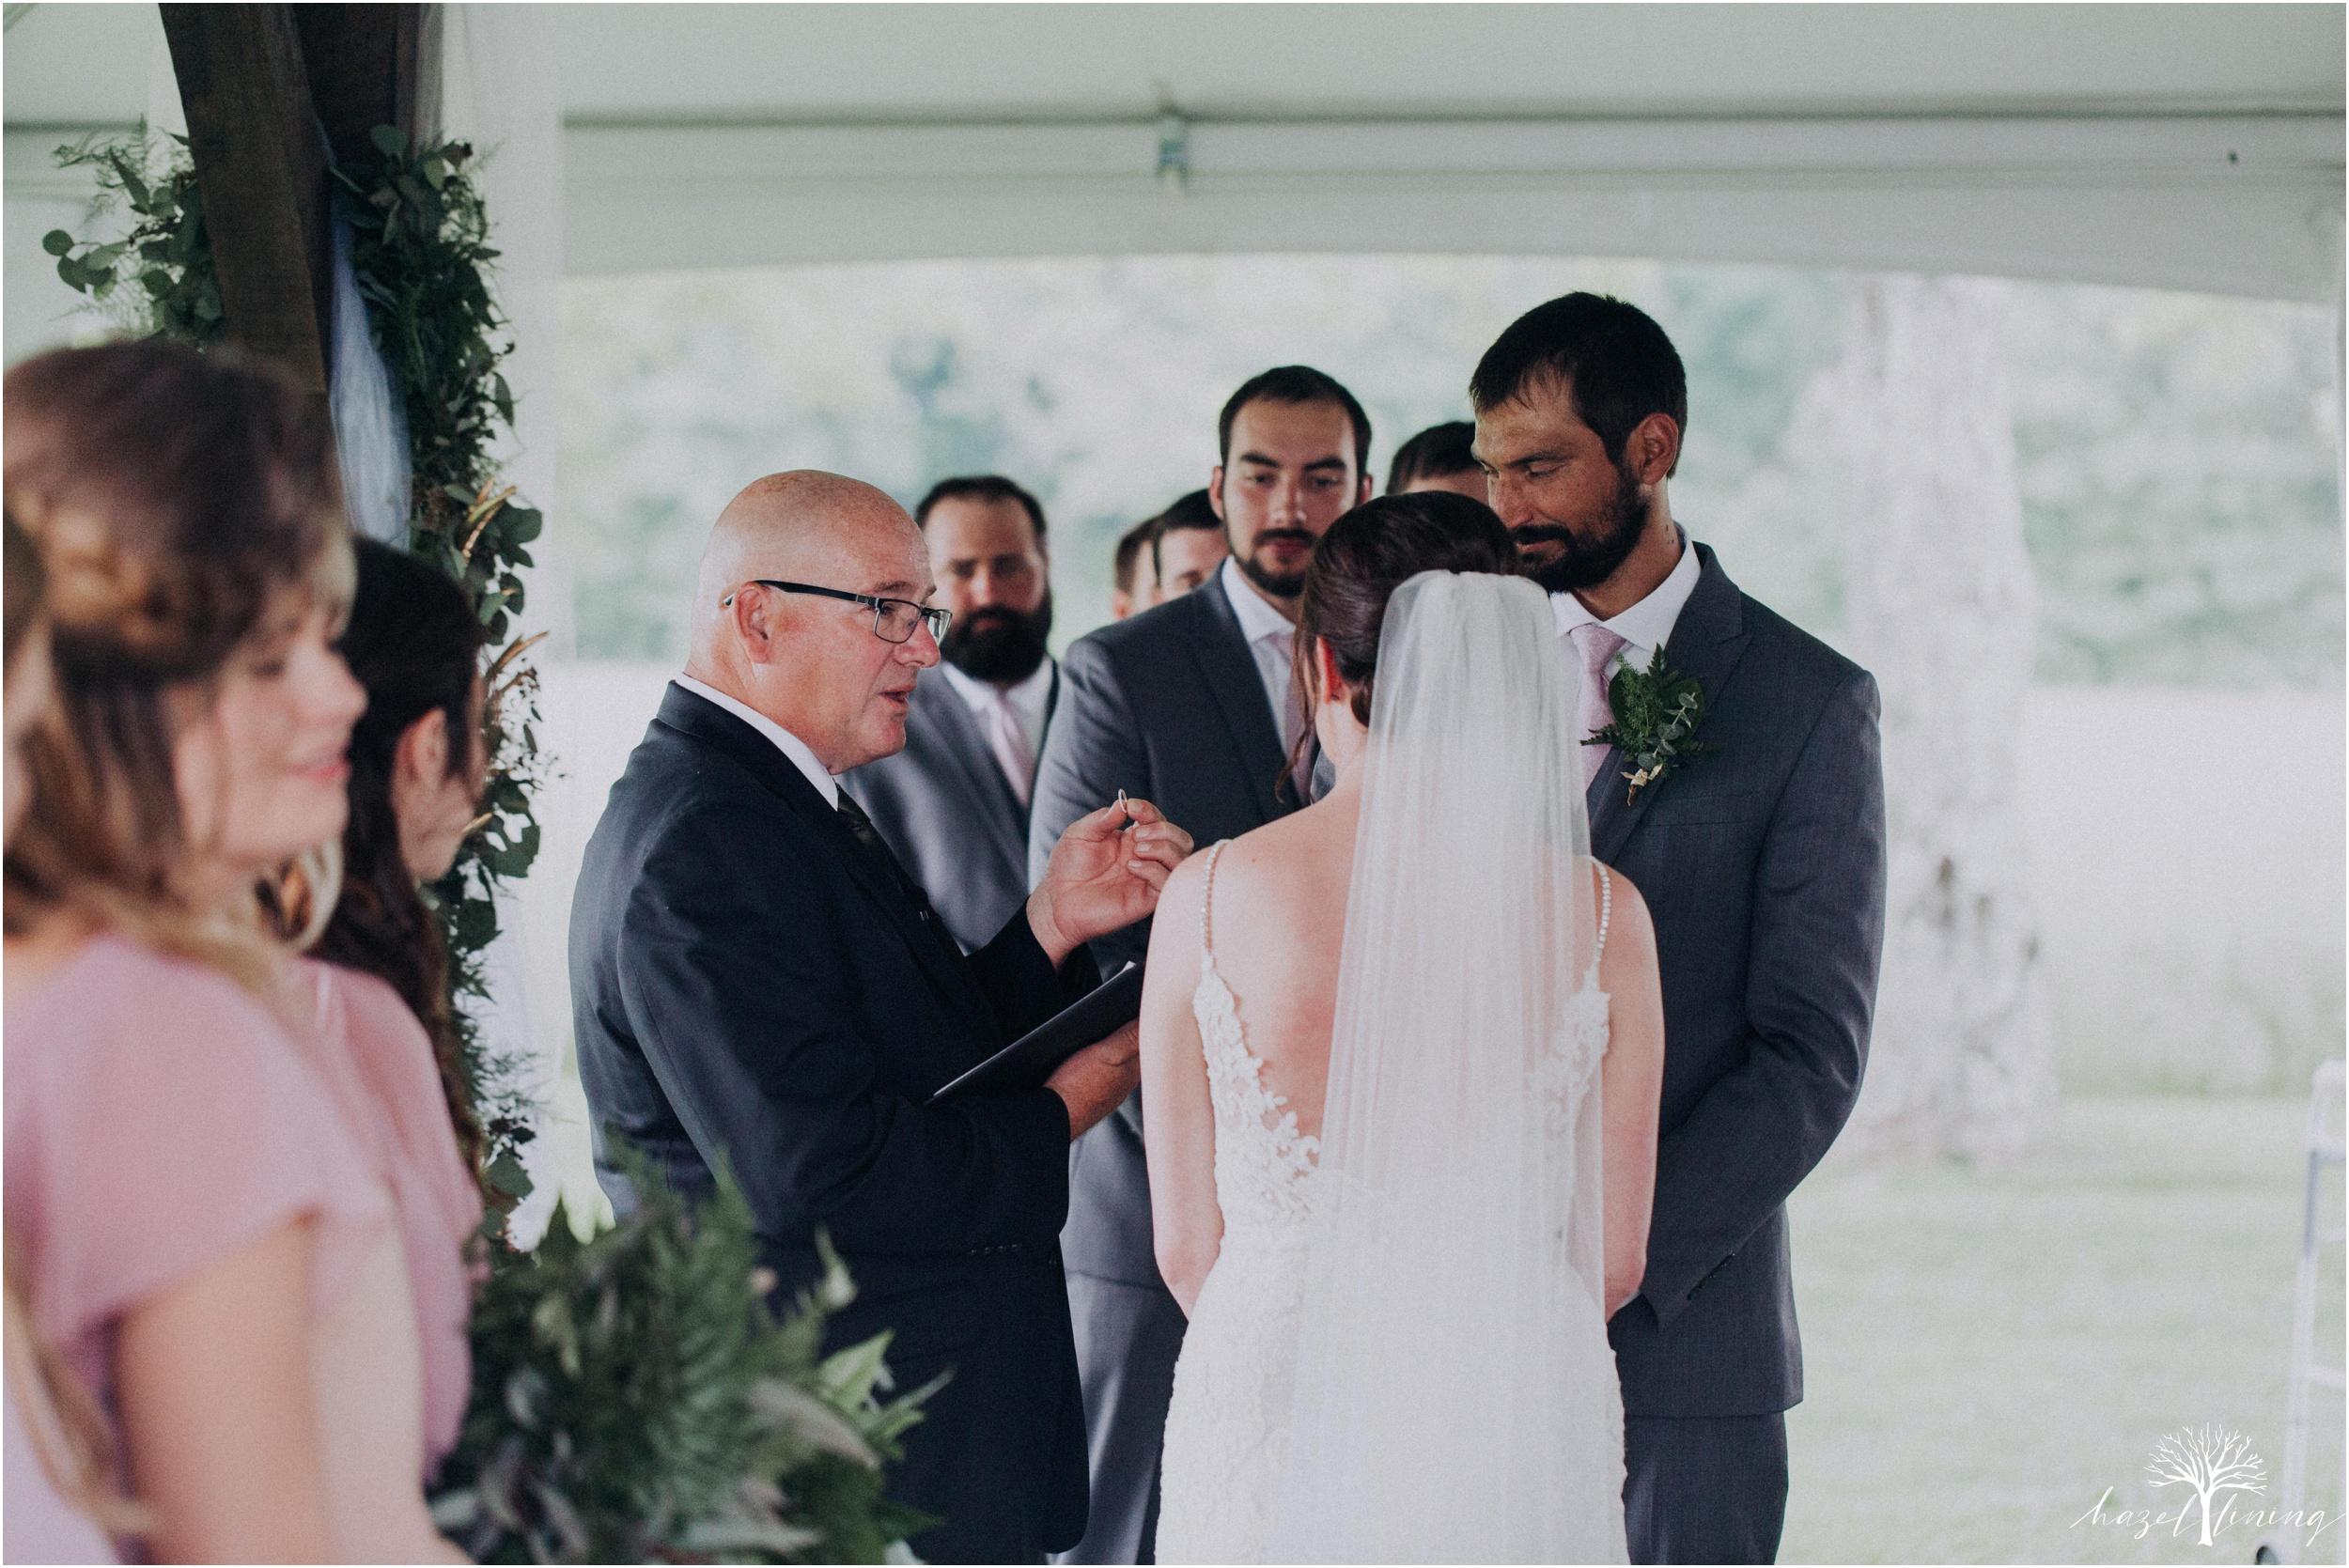 hazel-lining-travel-wedding-elopement-photography-lisa-landon-shoemaker-the-farm-bakery-and-events-bucks-county-quakertown-pennsylvania-summer-country-outdoor-farm-wedding_0062.jpg